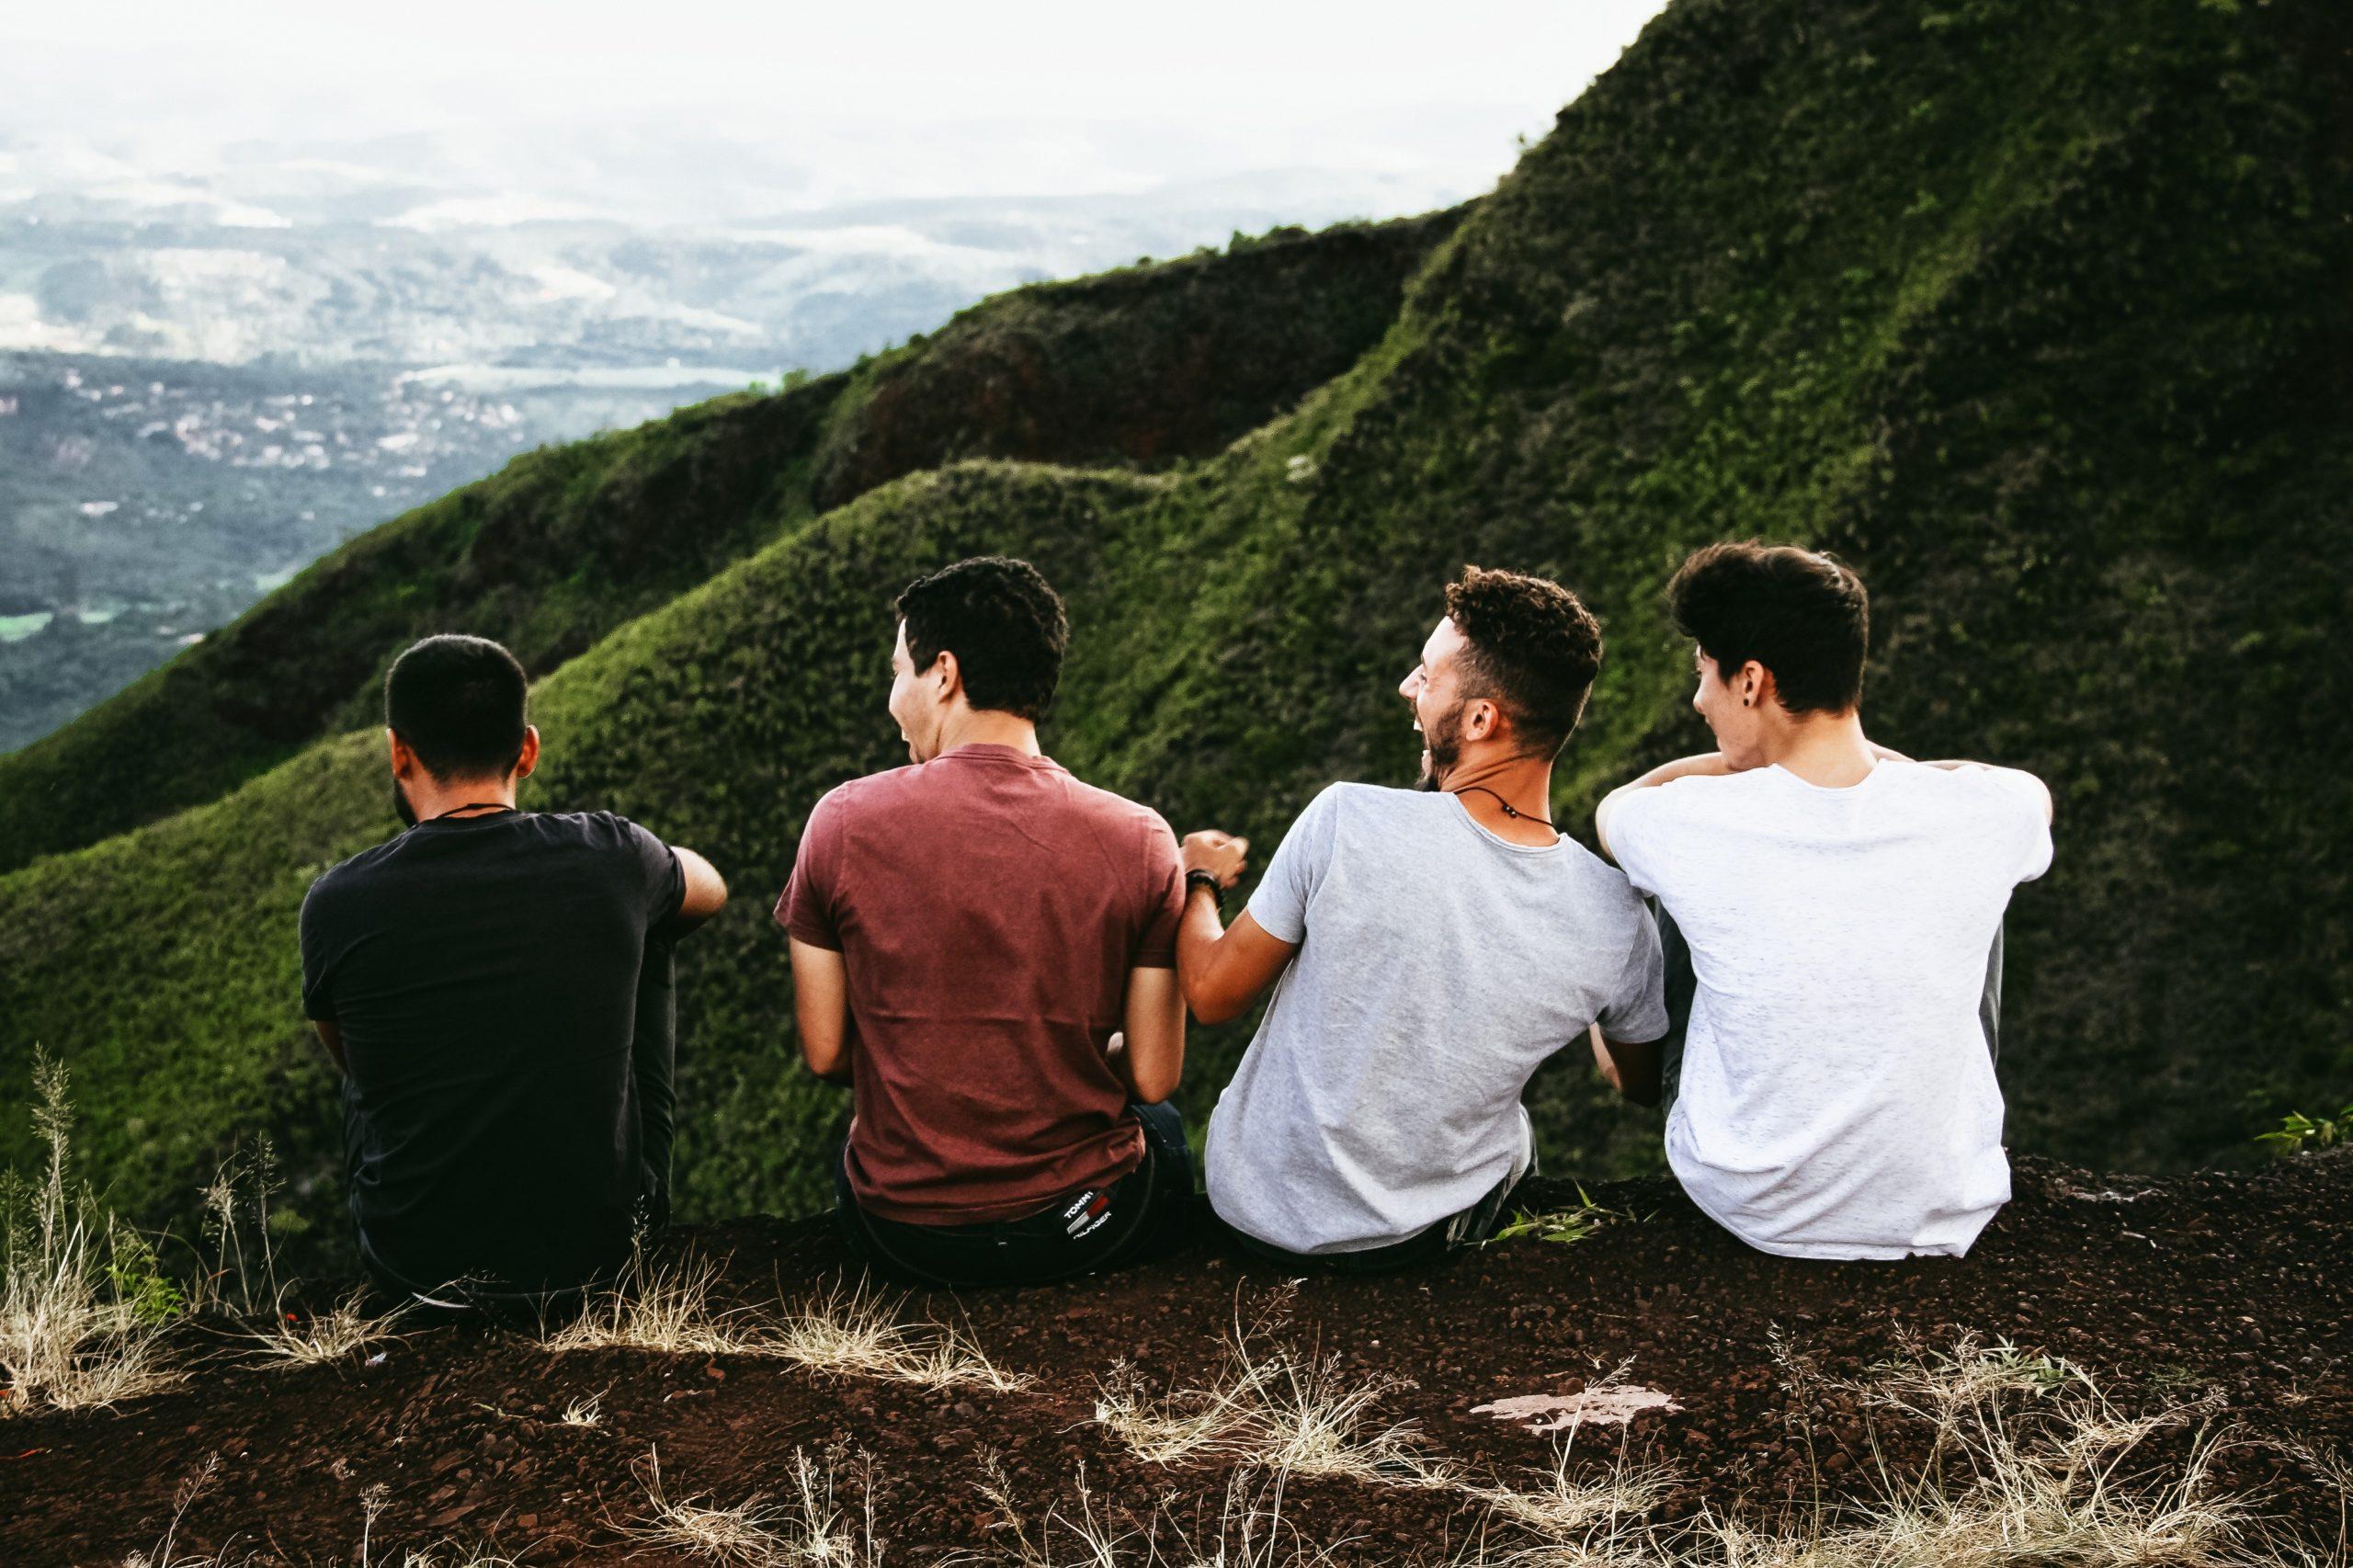 How can you find a true friend?